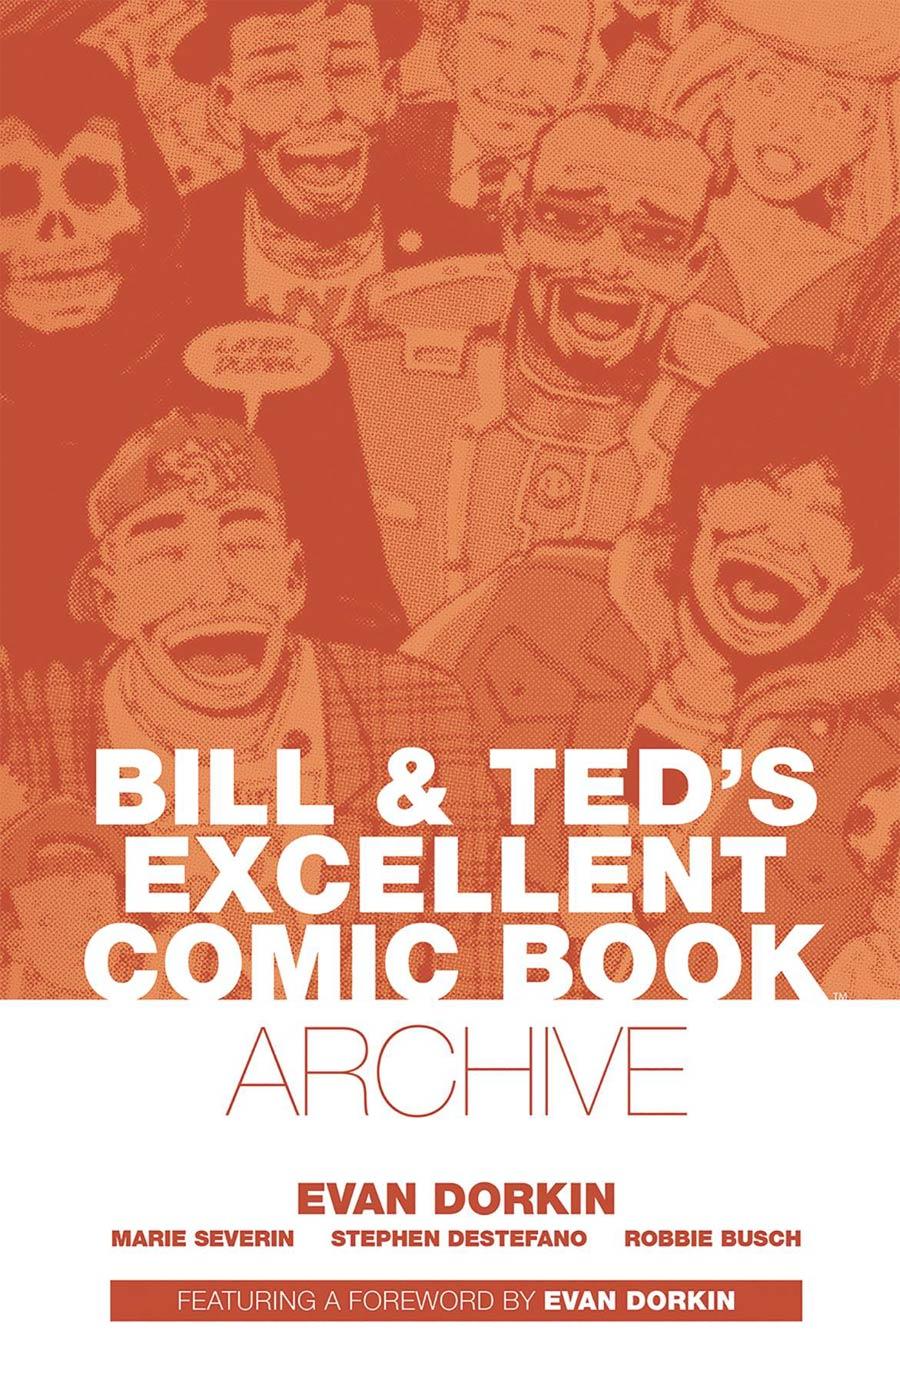 Bill & Teds Excellent Comic Book Archive TP